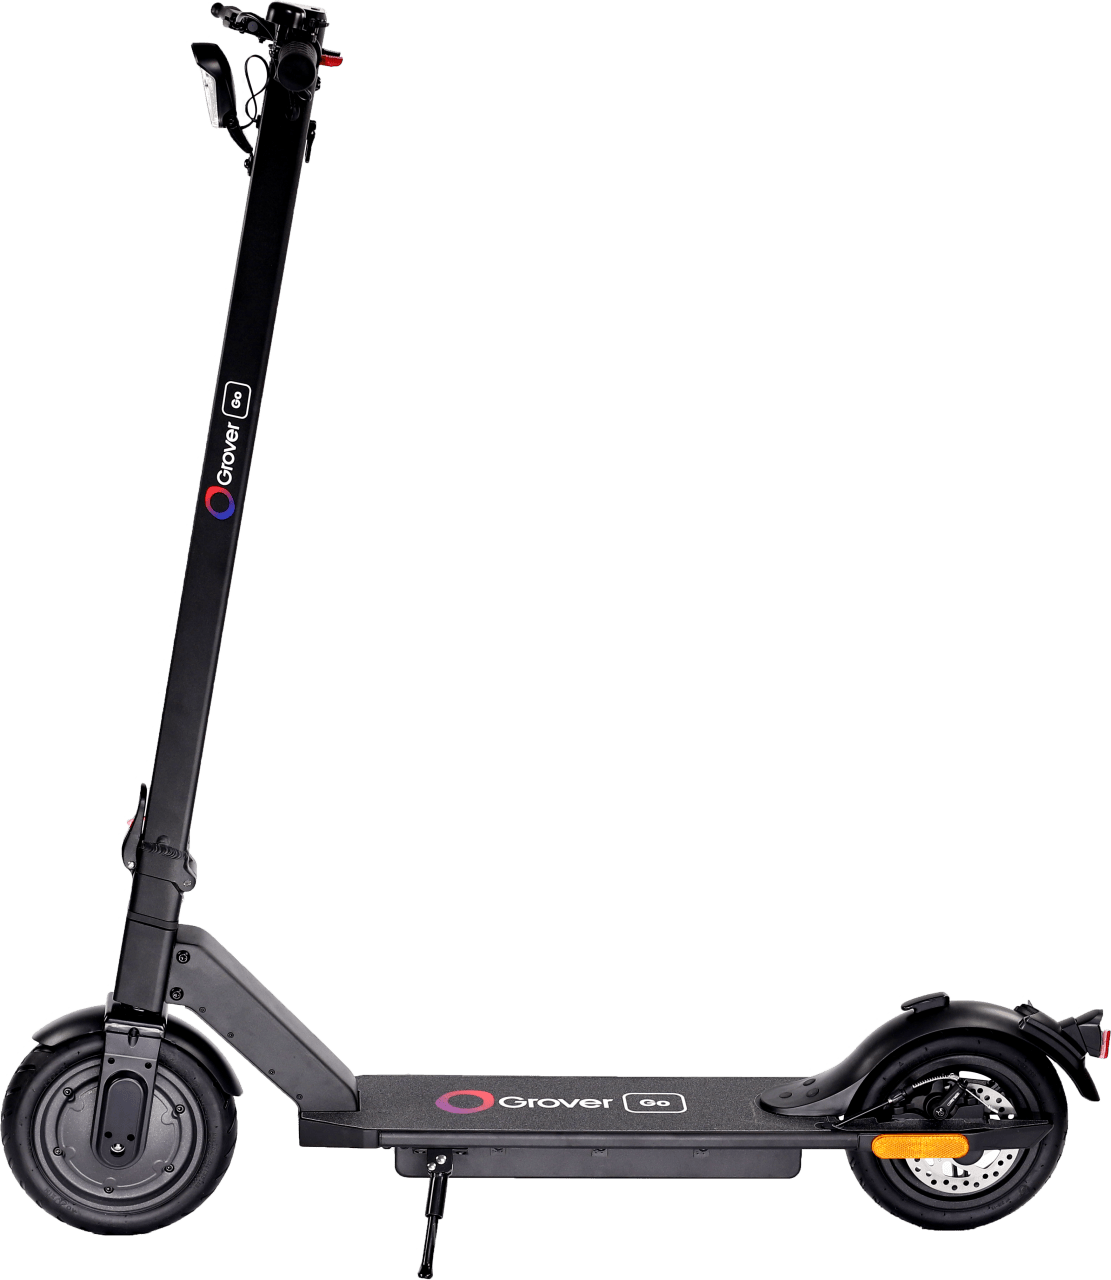 Schwarz GroverGo Scooter.4